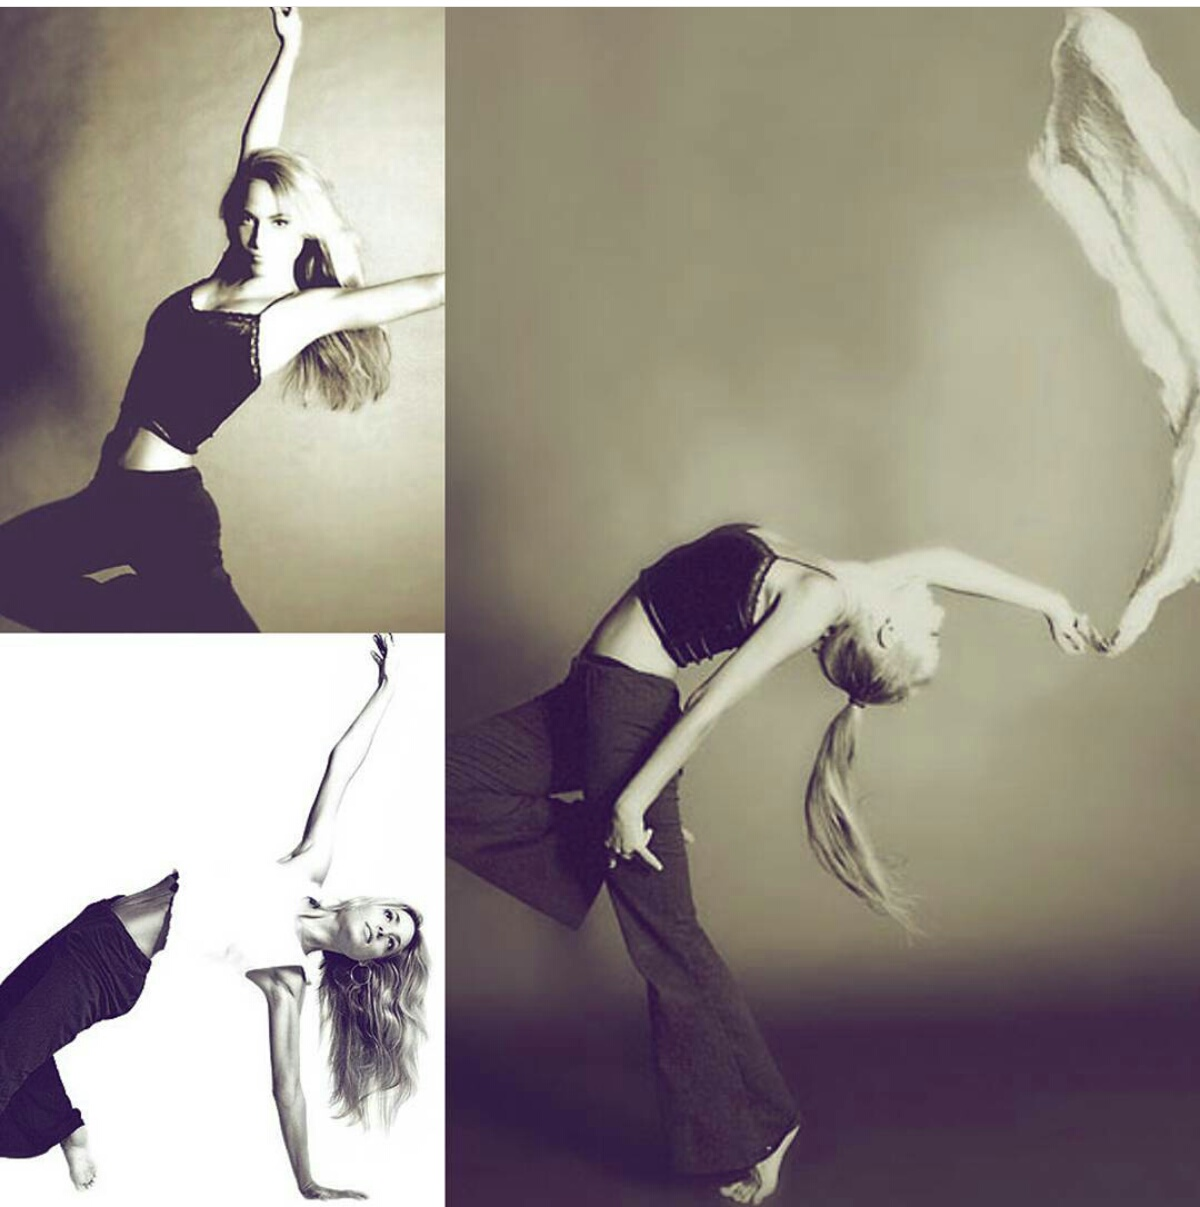 Jessica's dance photoshoot with world-famous photographer Lorenzo Scaccini